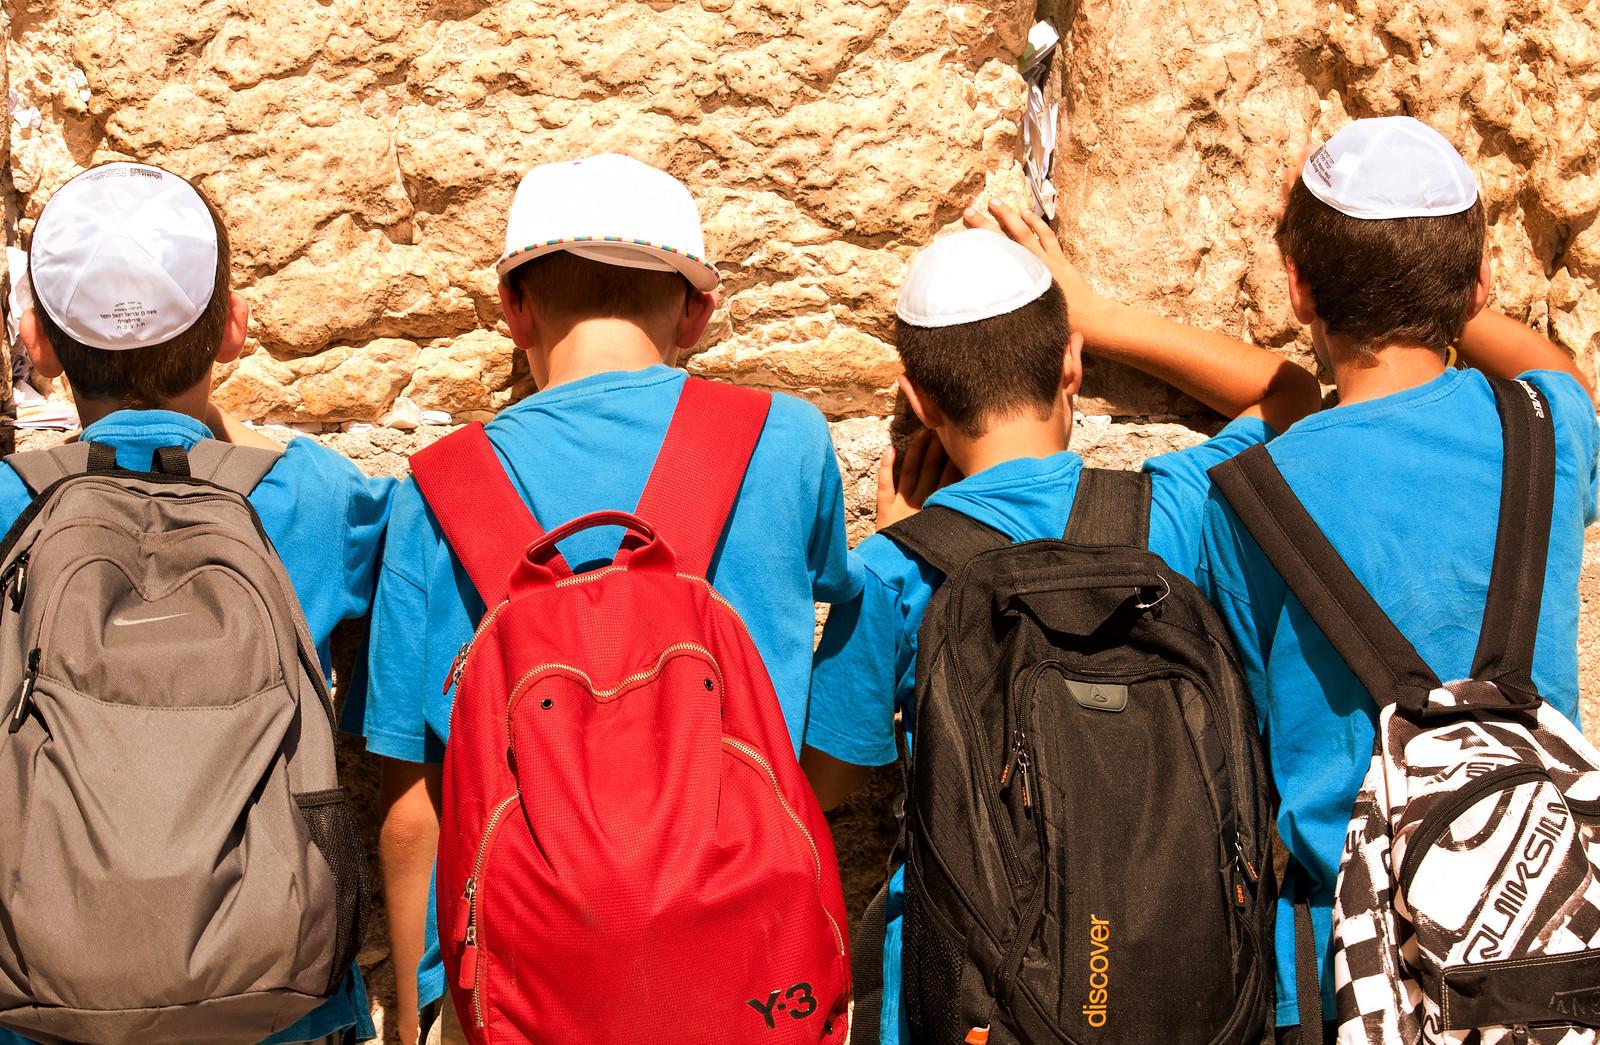 Jerusalem_Western Wall_4_Noam Chen_IMOT